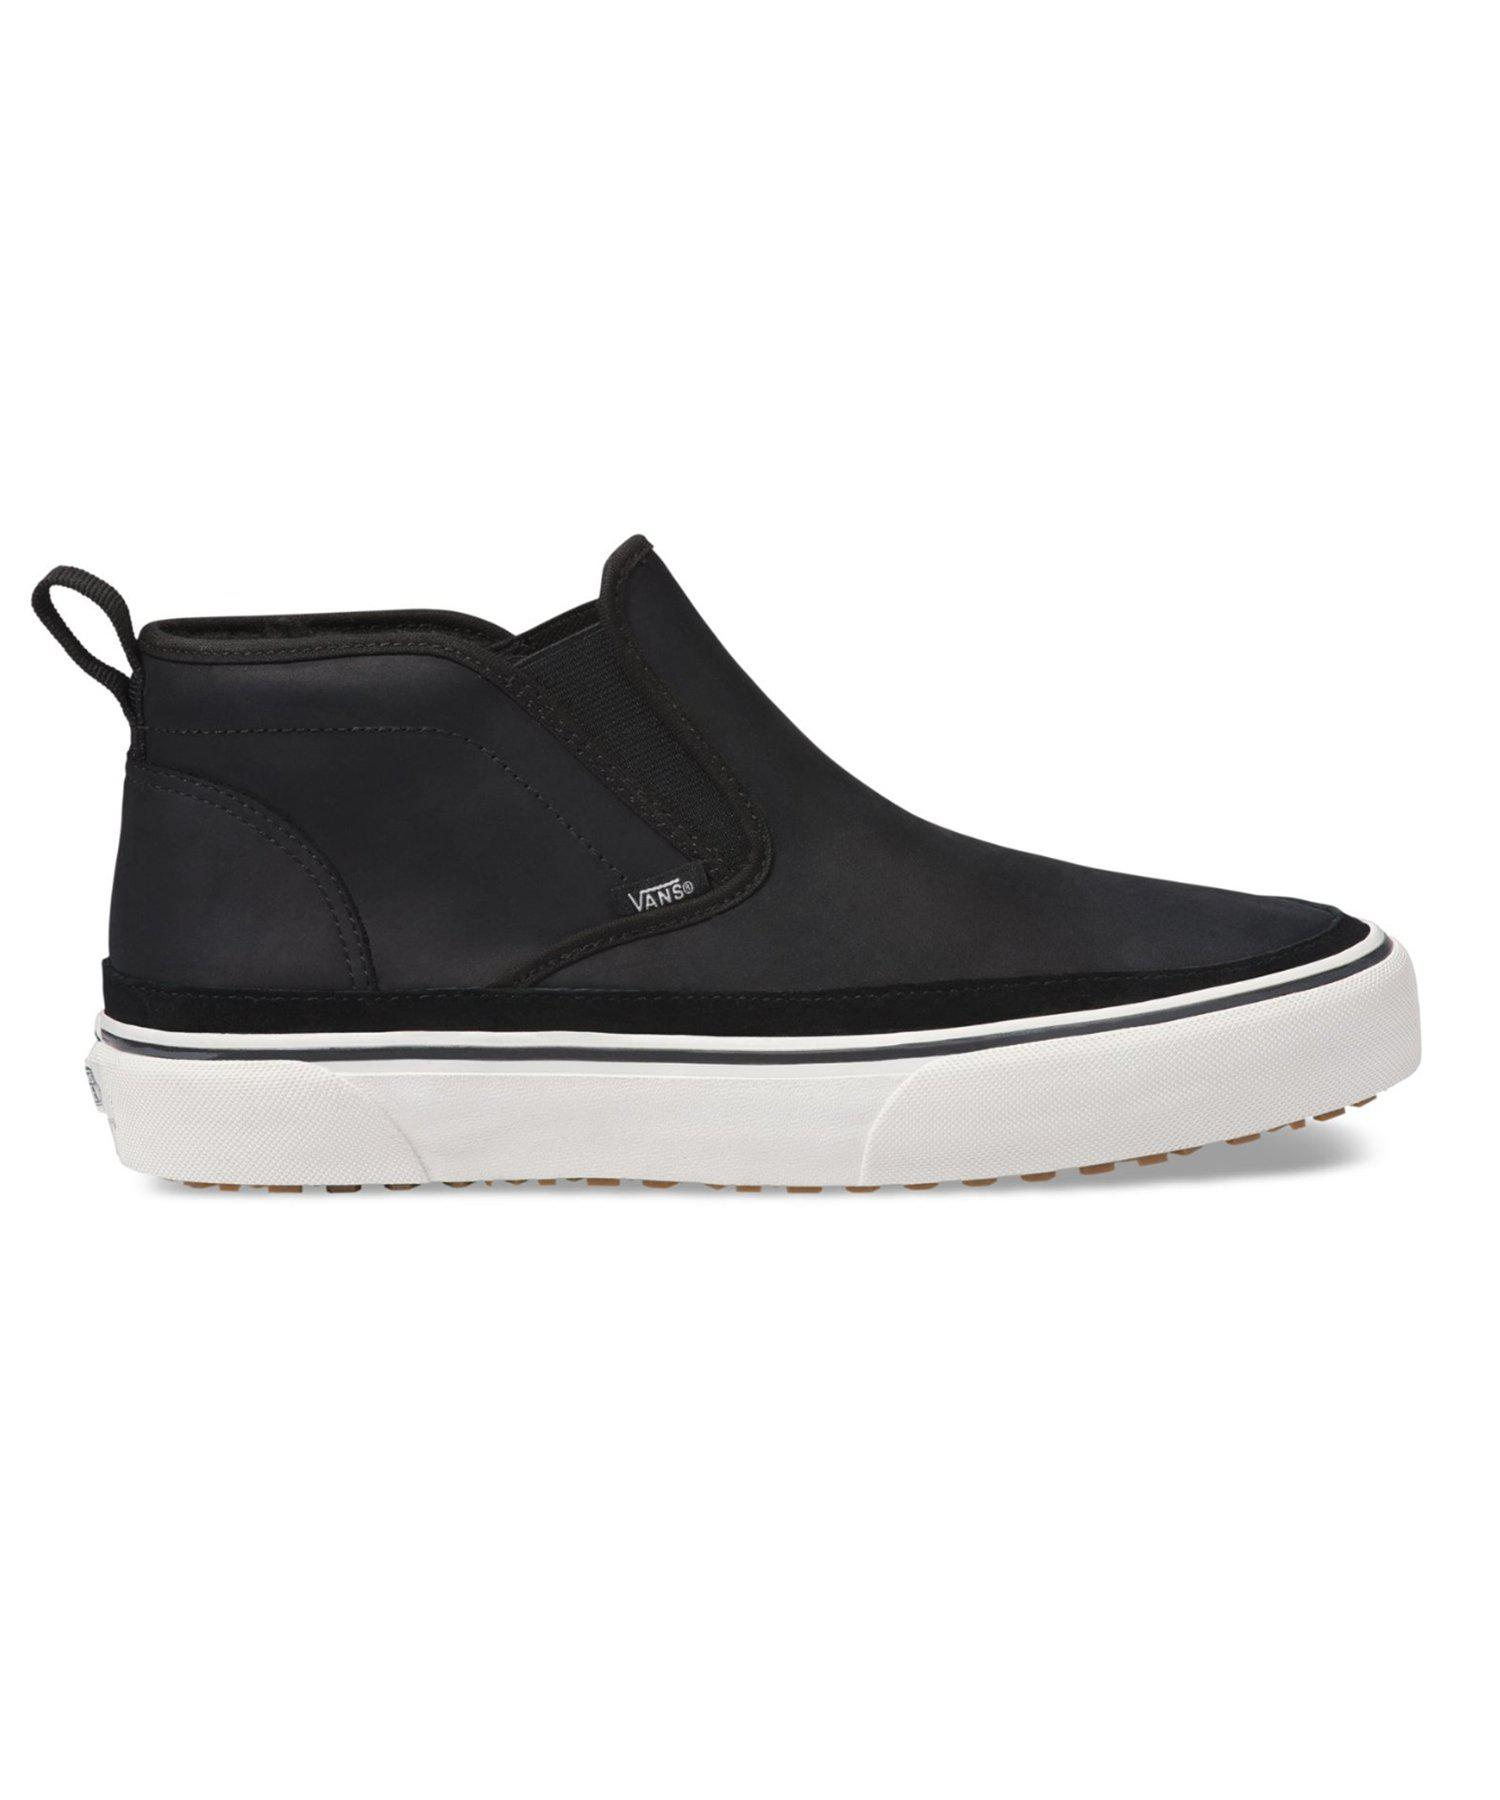 Lyst - Vans Mid Slip Sf Mte In Black in Black for Men - Save  51.111111111111114% 1f7a0ec53